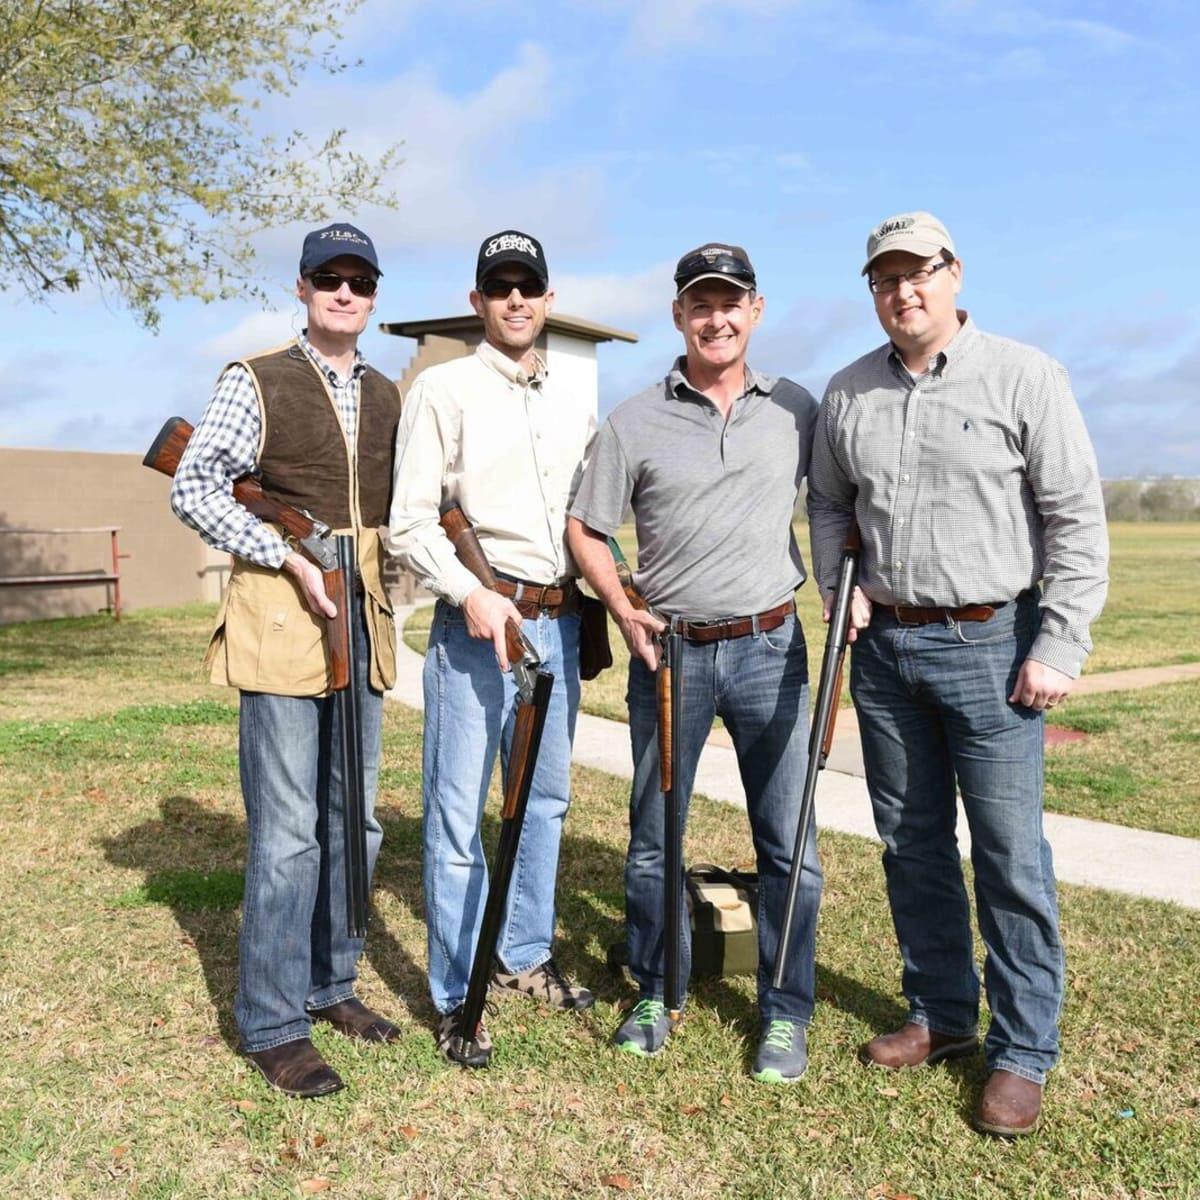 Craig Cordola, Wade Burgess, Scott Breeze, Greg Haralson at Memorial Hermann Clay Shoot